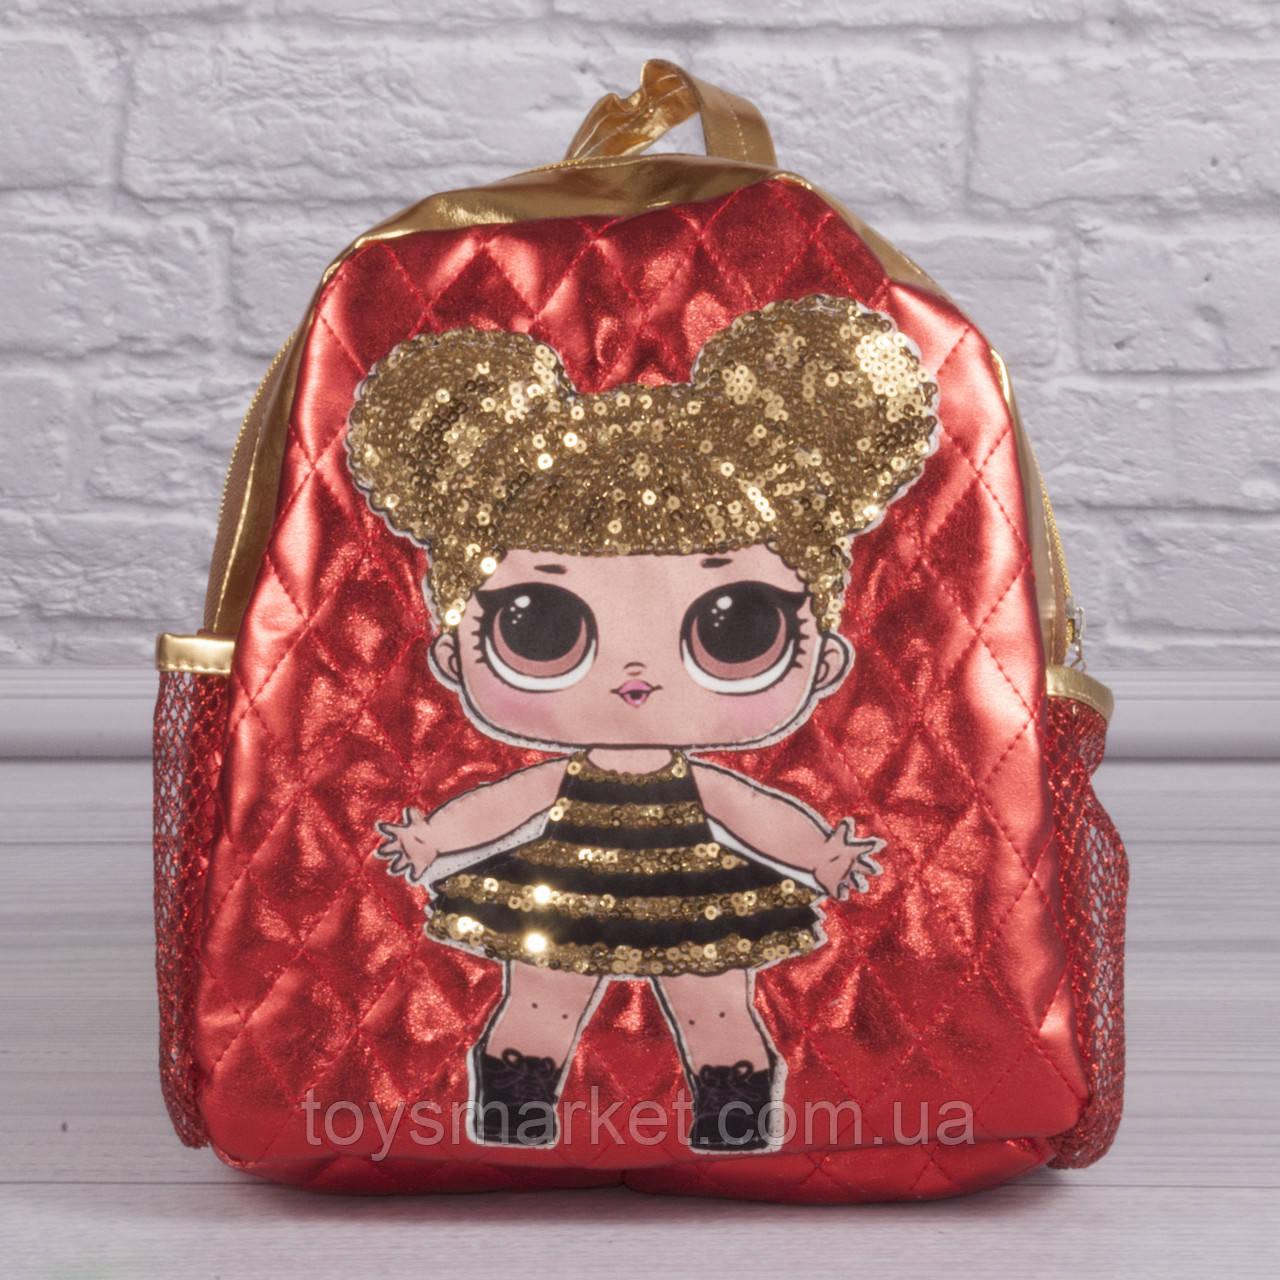 Детский рюкзак с куклой LOL, Куклы LOL, ЛОЛ